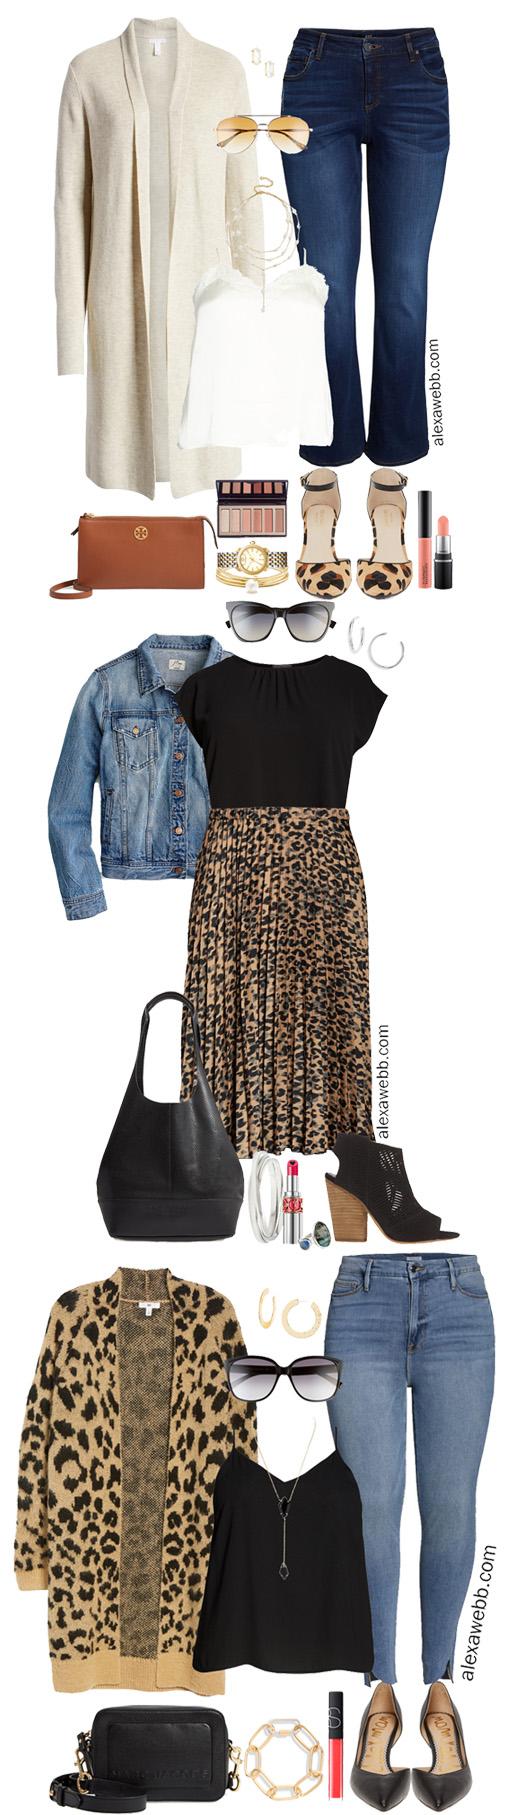 Nordstrom Anniversary Sale 2019 – Plus Size Outfits - Plus Size Leopard Cardigan, Good American Skinny Jeans, Camisole, Pumps, Crossbody Bag - Plus Size Fashion for Women - alexawebb.com #plussize #alexawebb